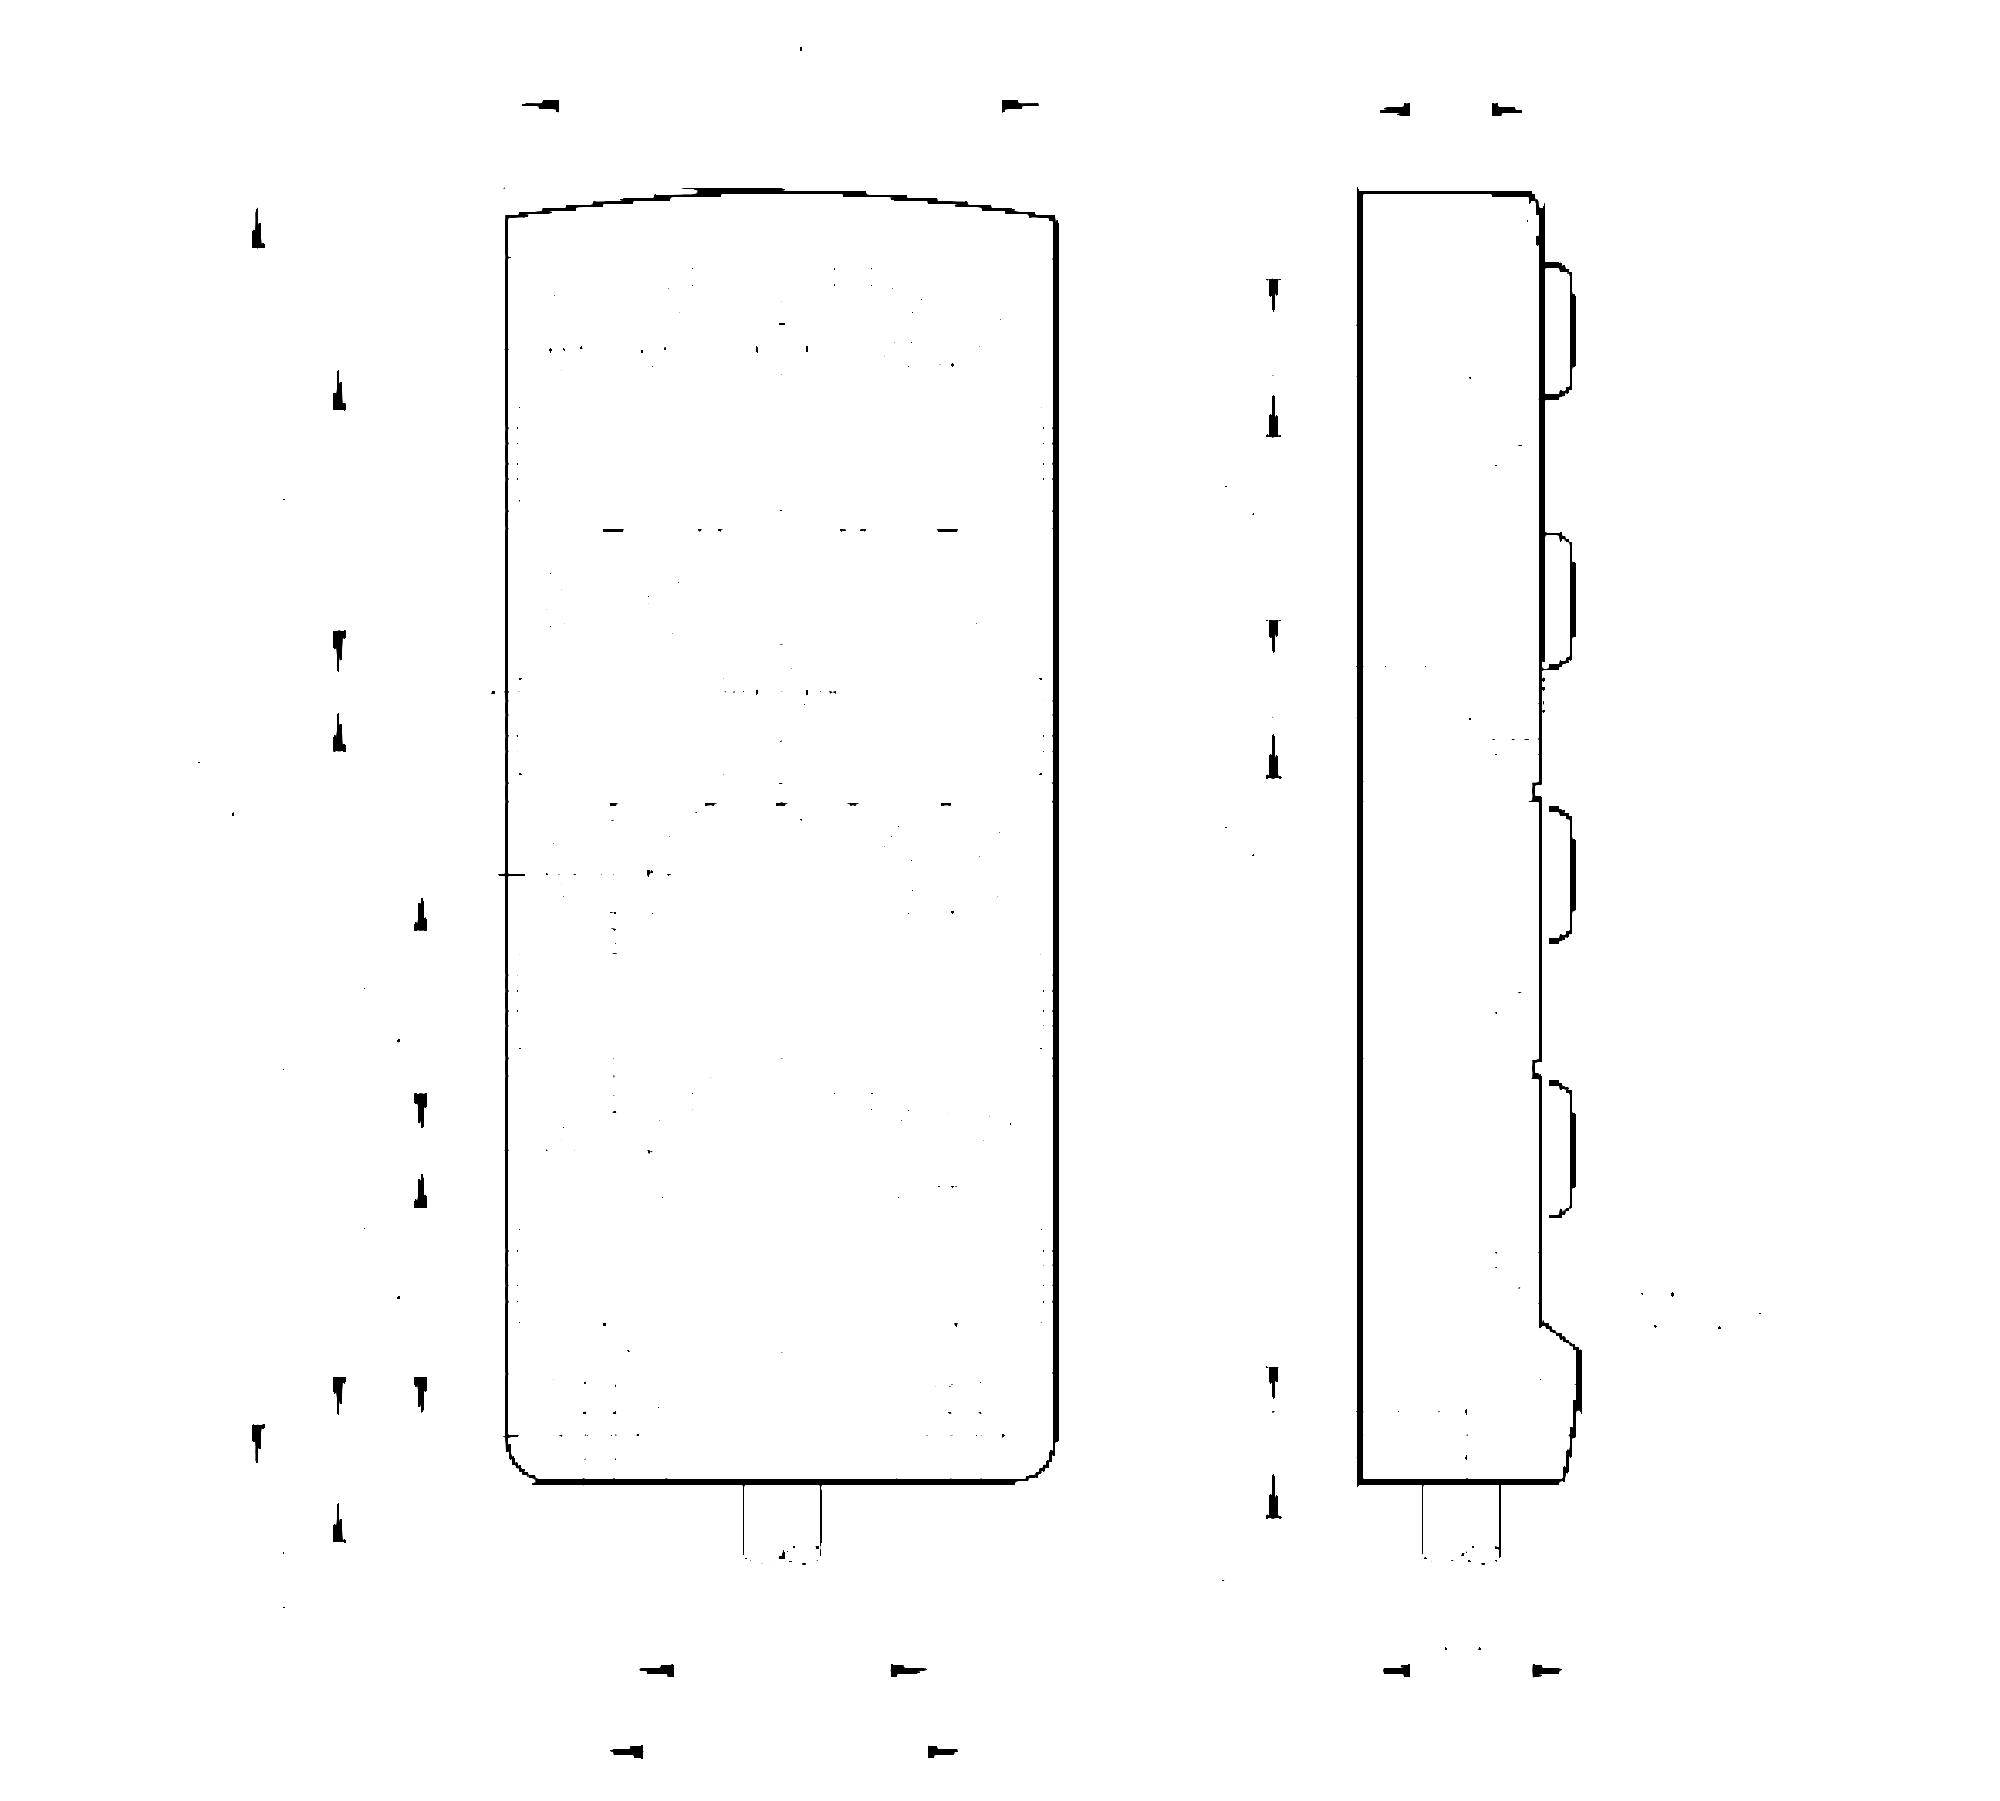 ebc023 - splitter box